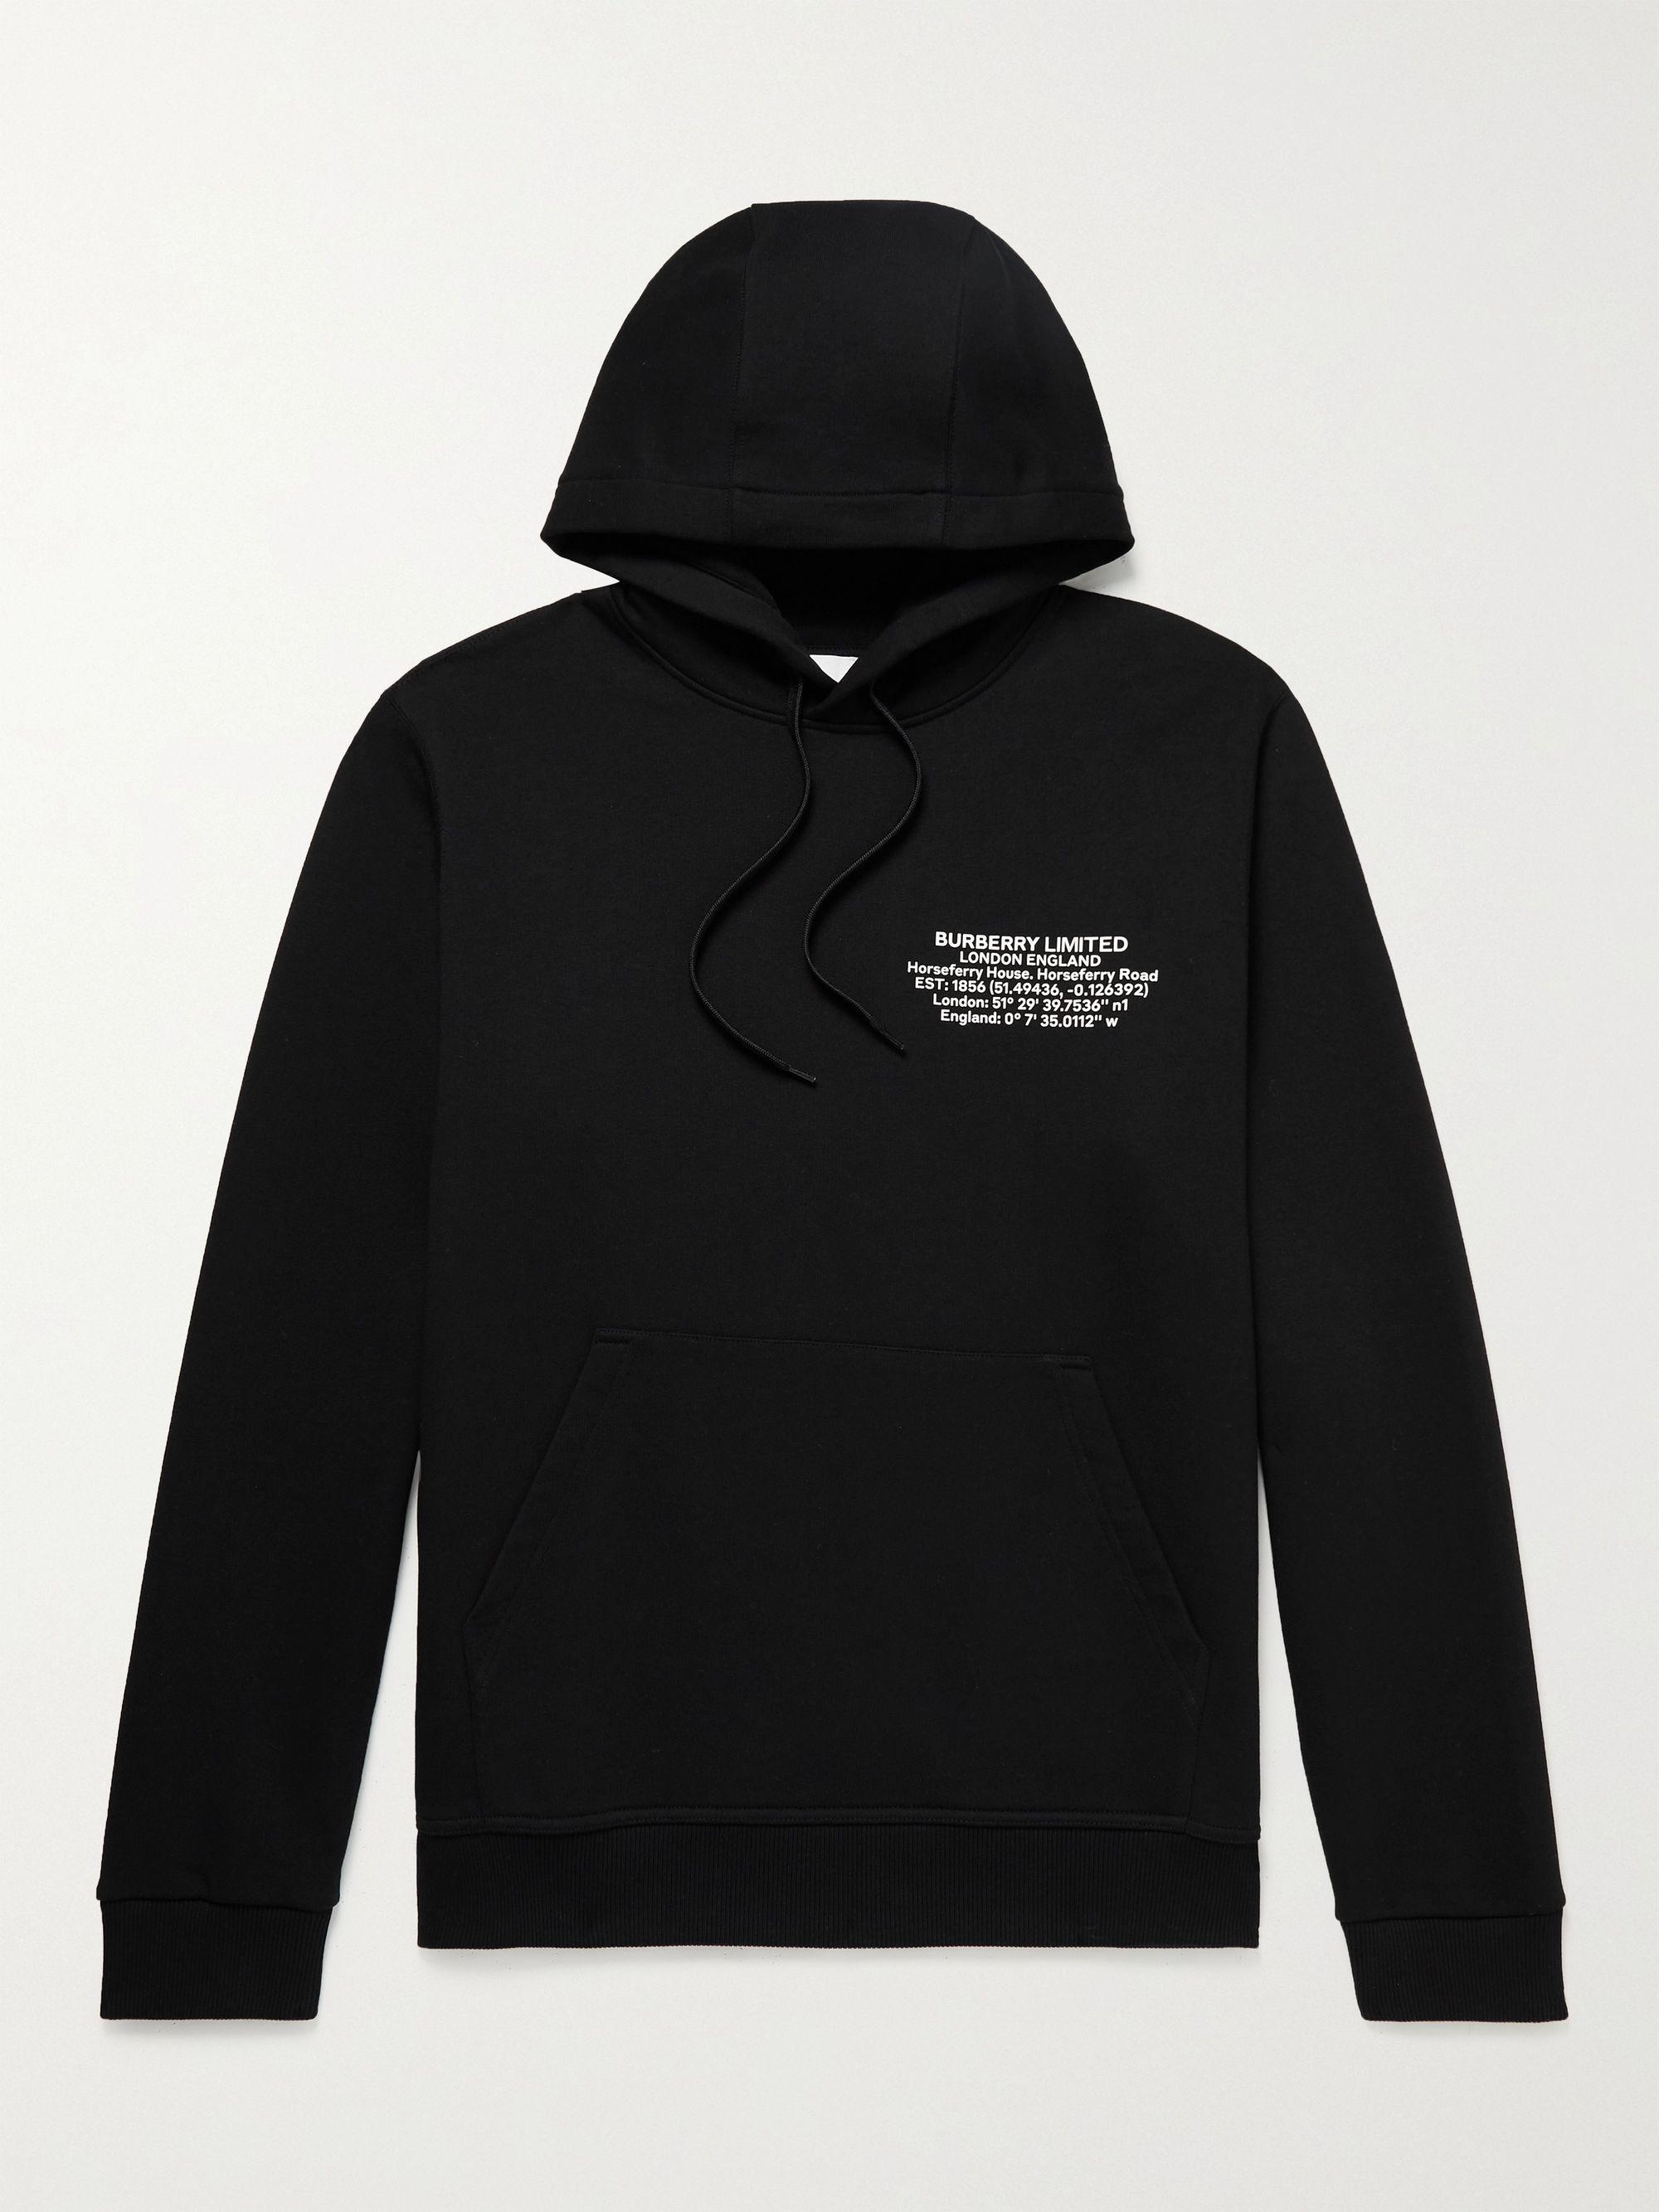 BURBERRY Oversized Logo-Print Cotton-Jersey Hoodie